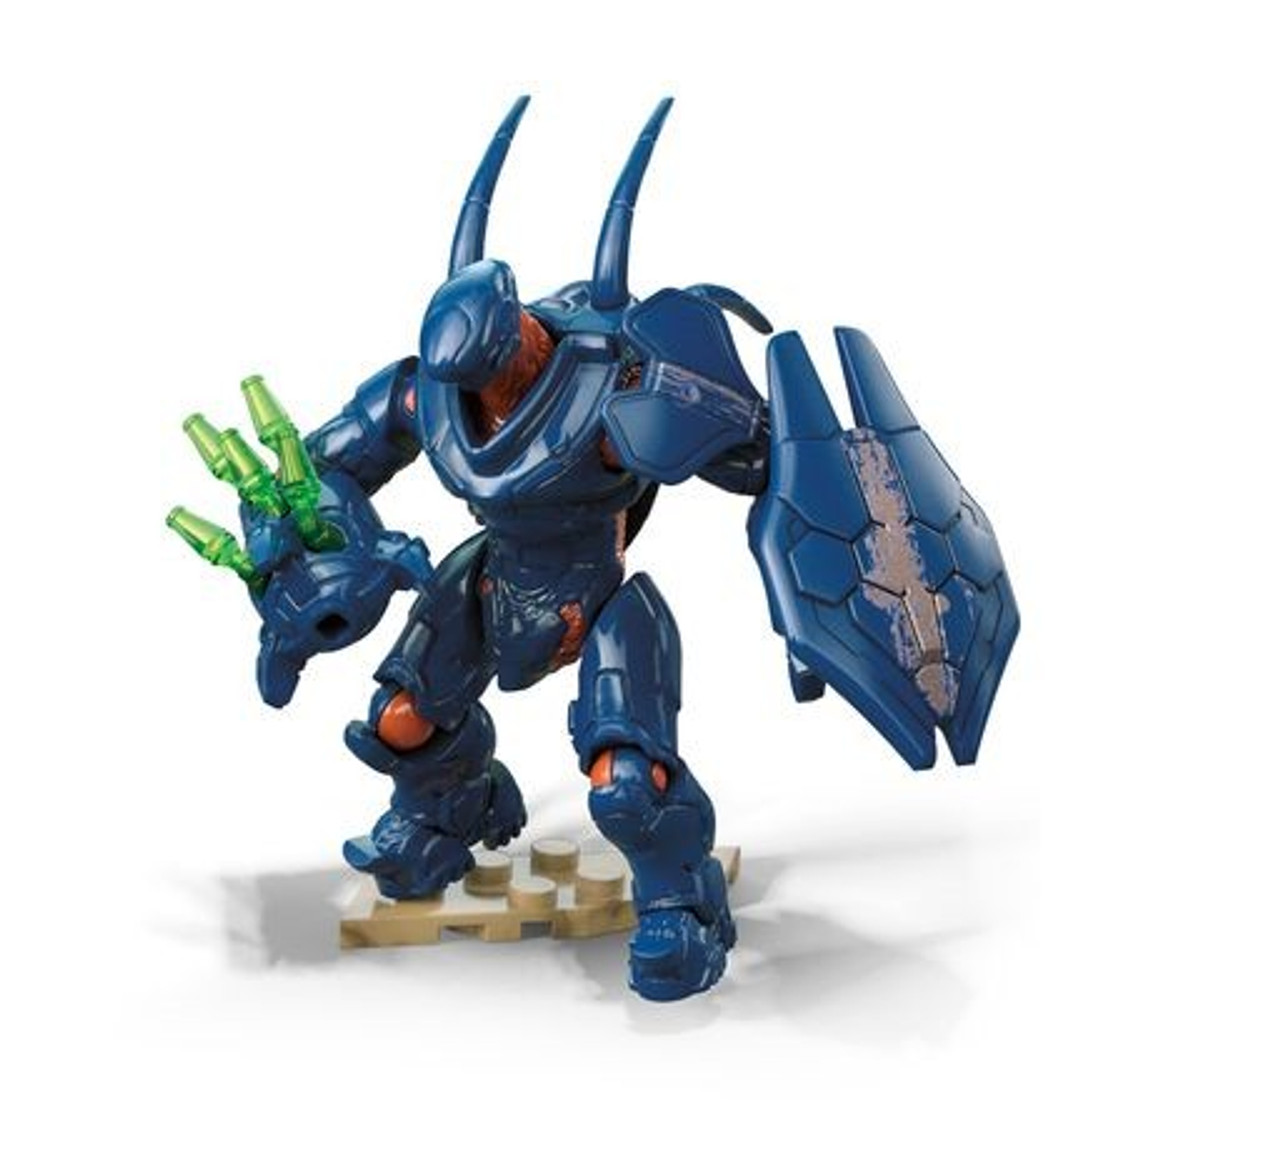 Halo Mega Construx Warzone Warthog Run Set Mattel - ToyWiz